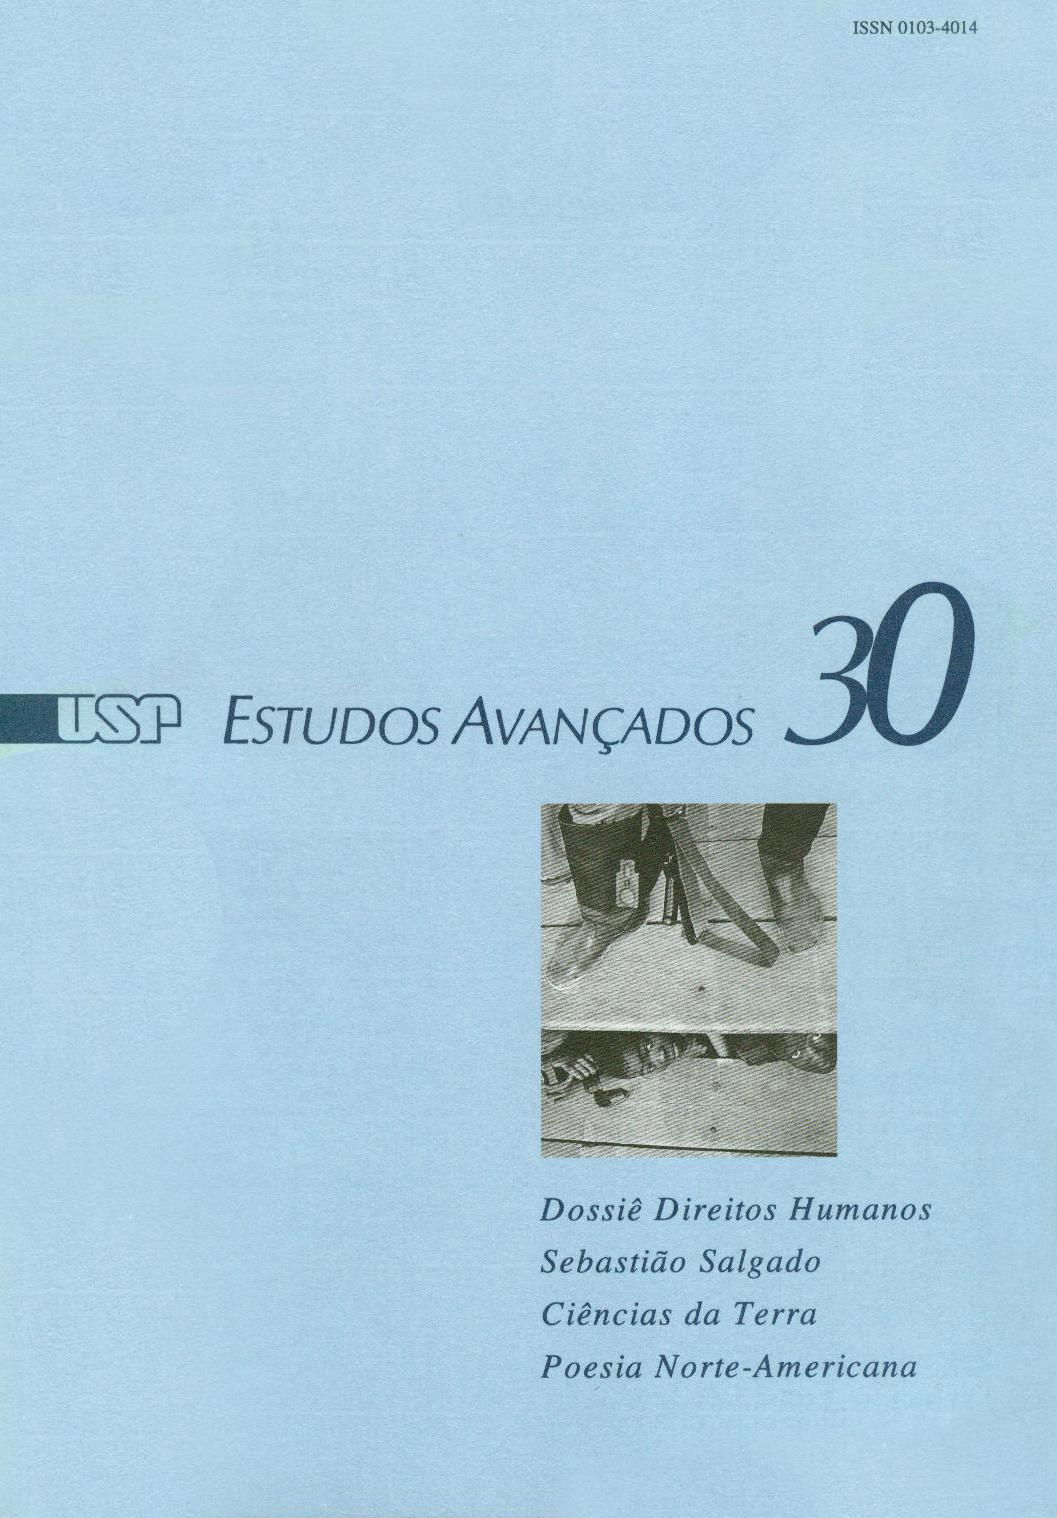 Visualizar v. 11 n. 30 (1997)